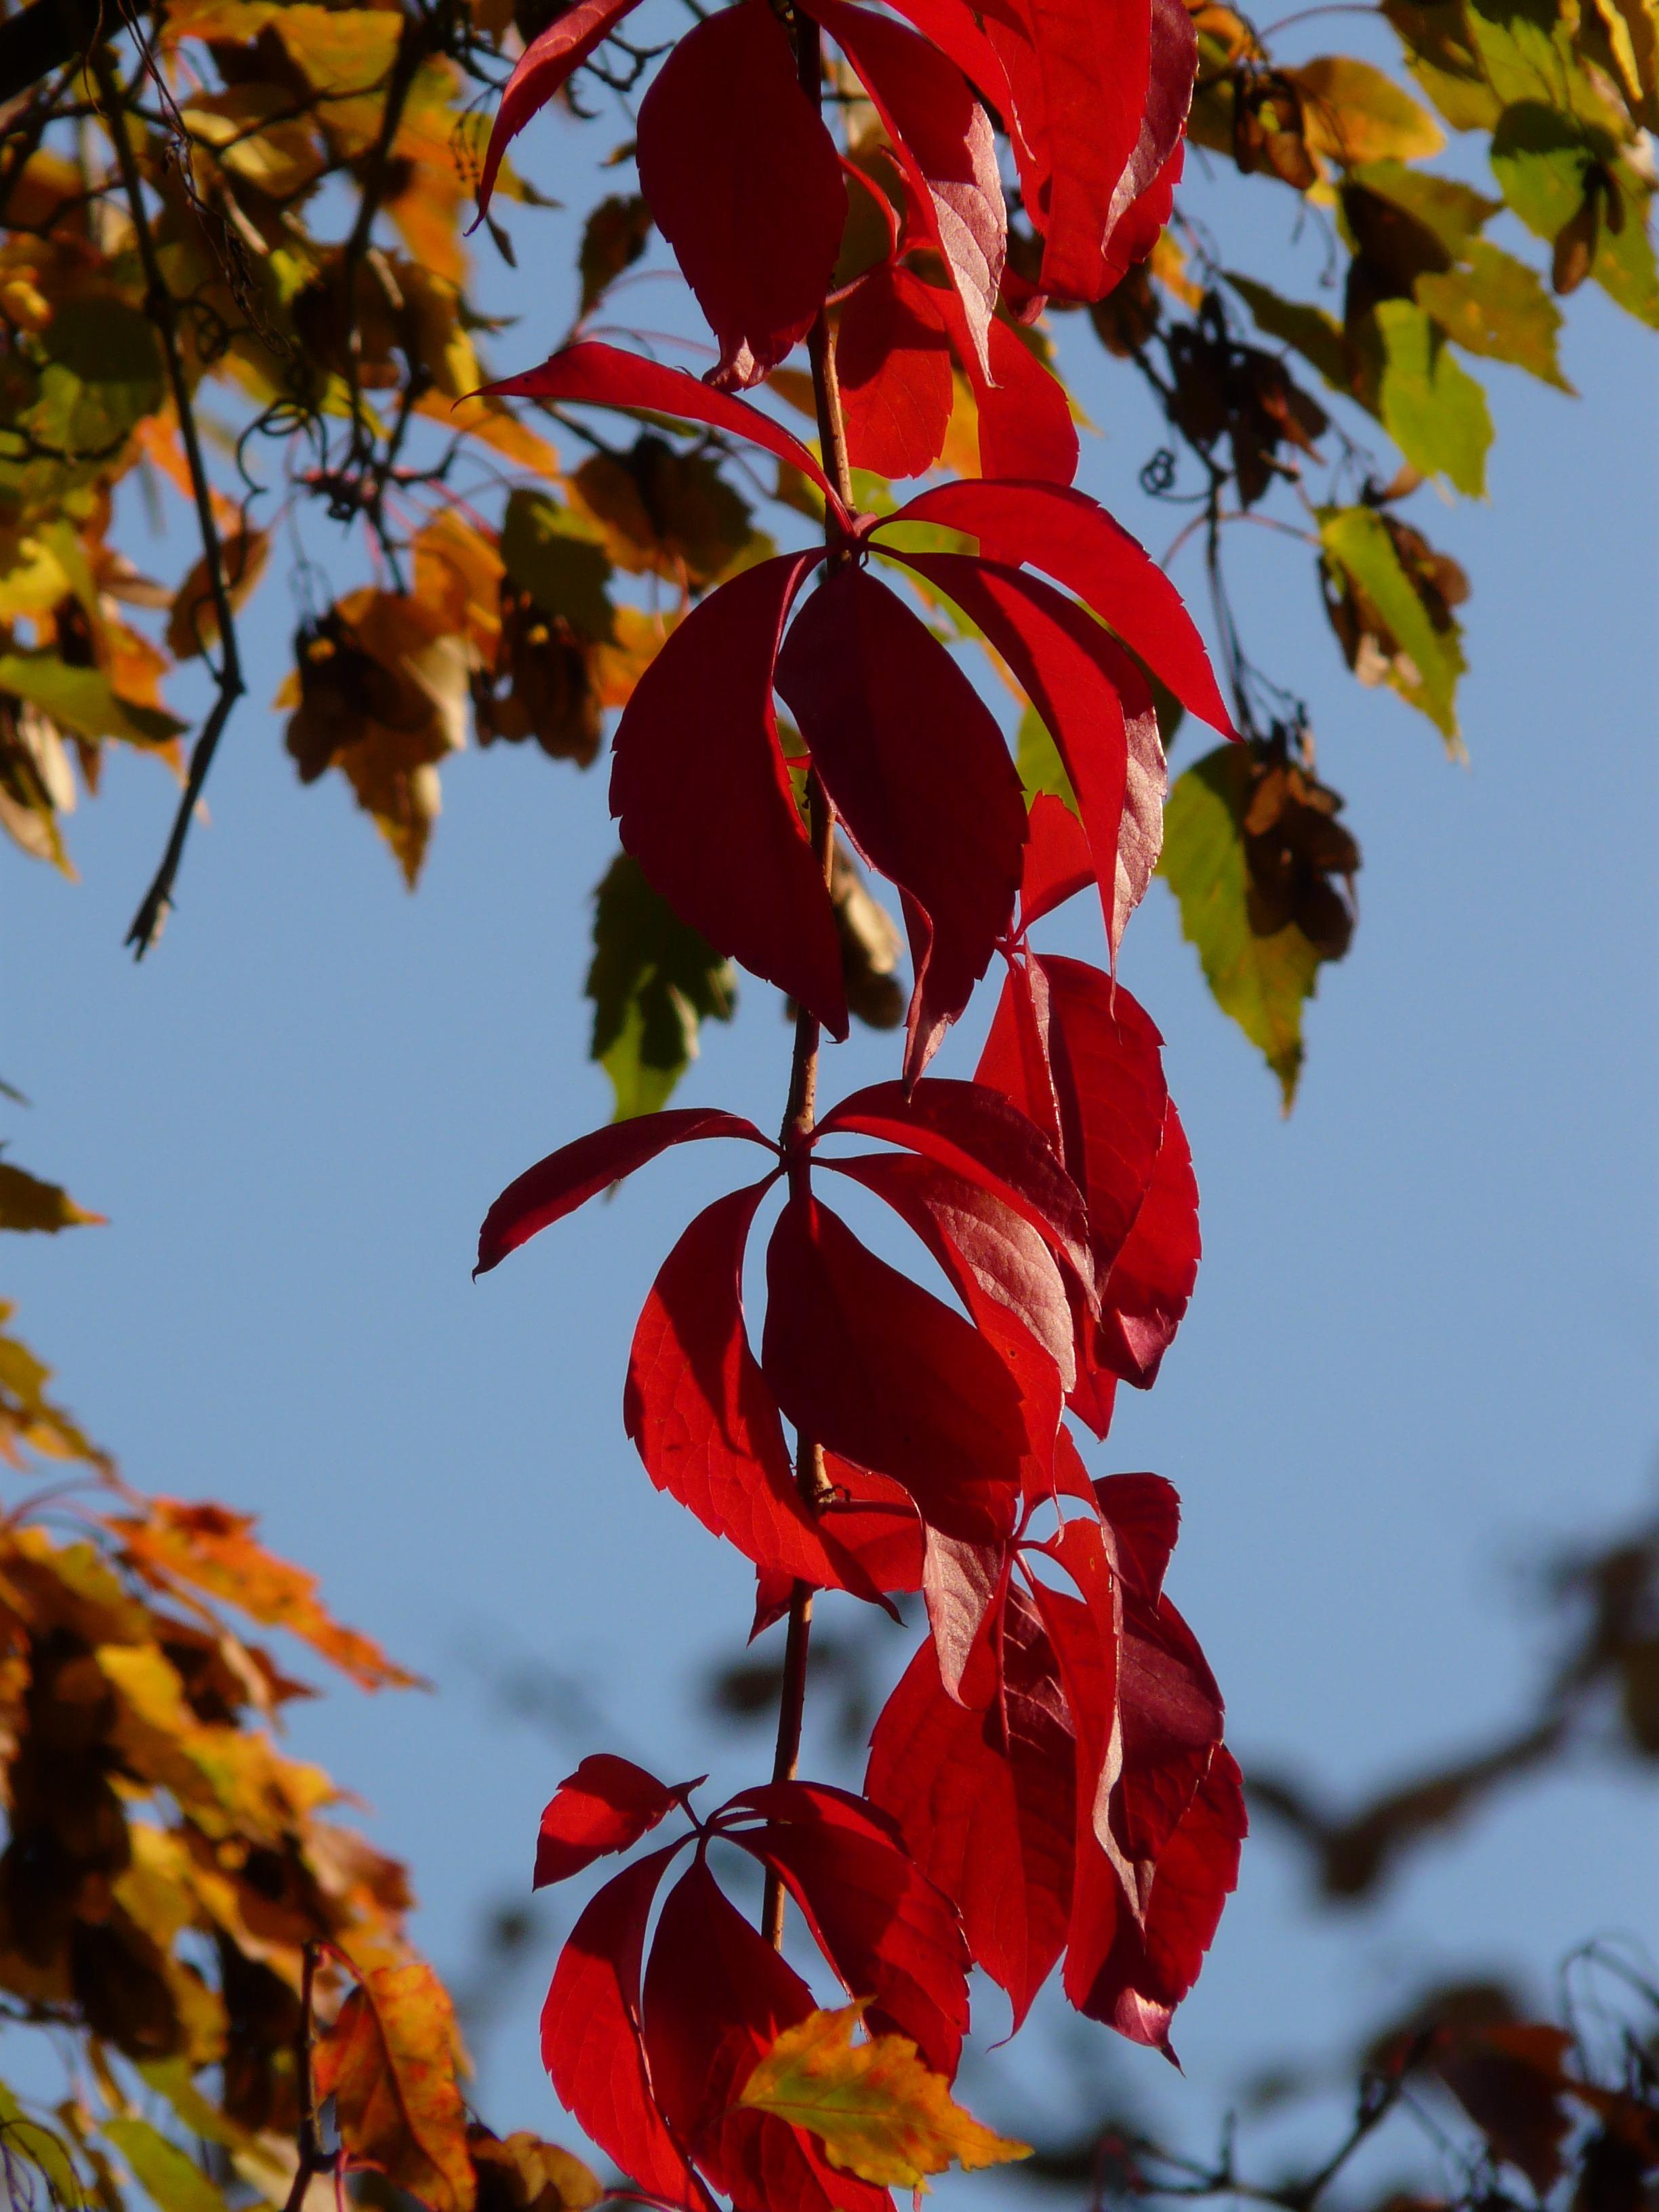 free images tree nature branch sunlight leaf flower petal